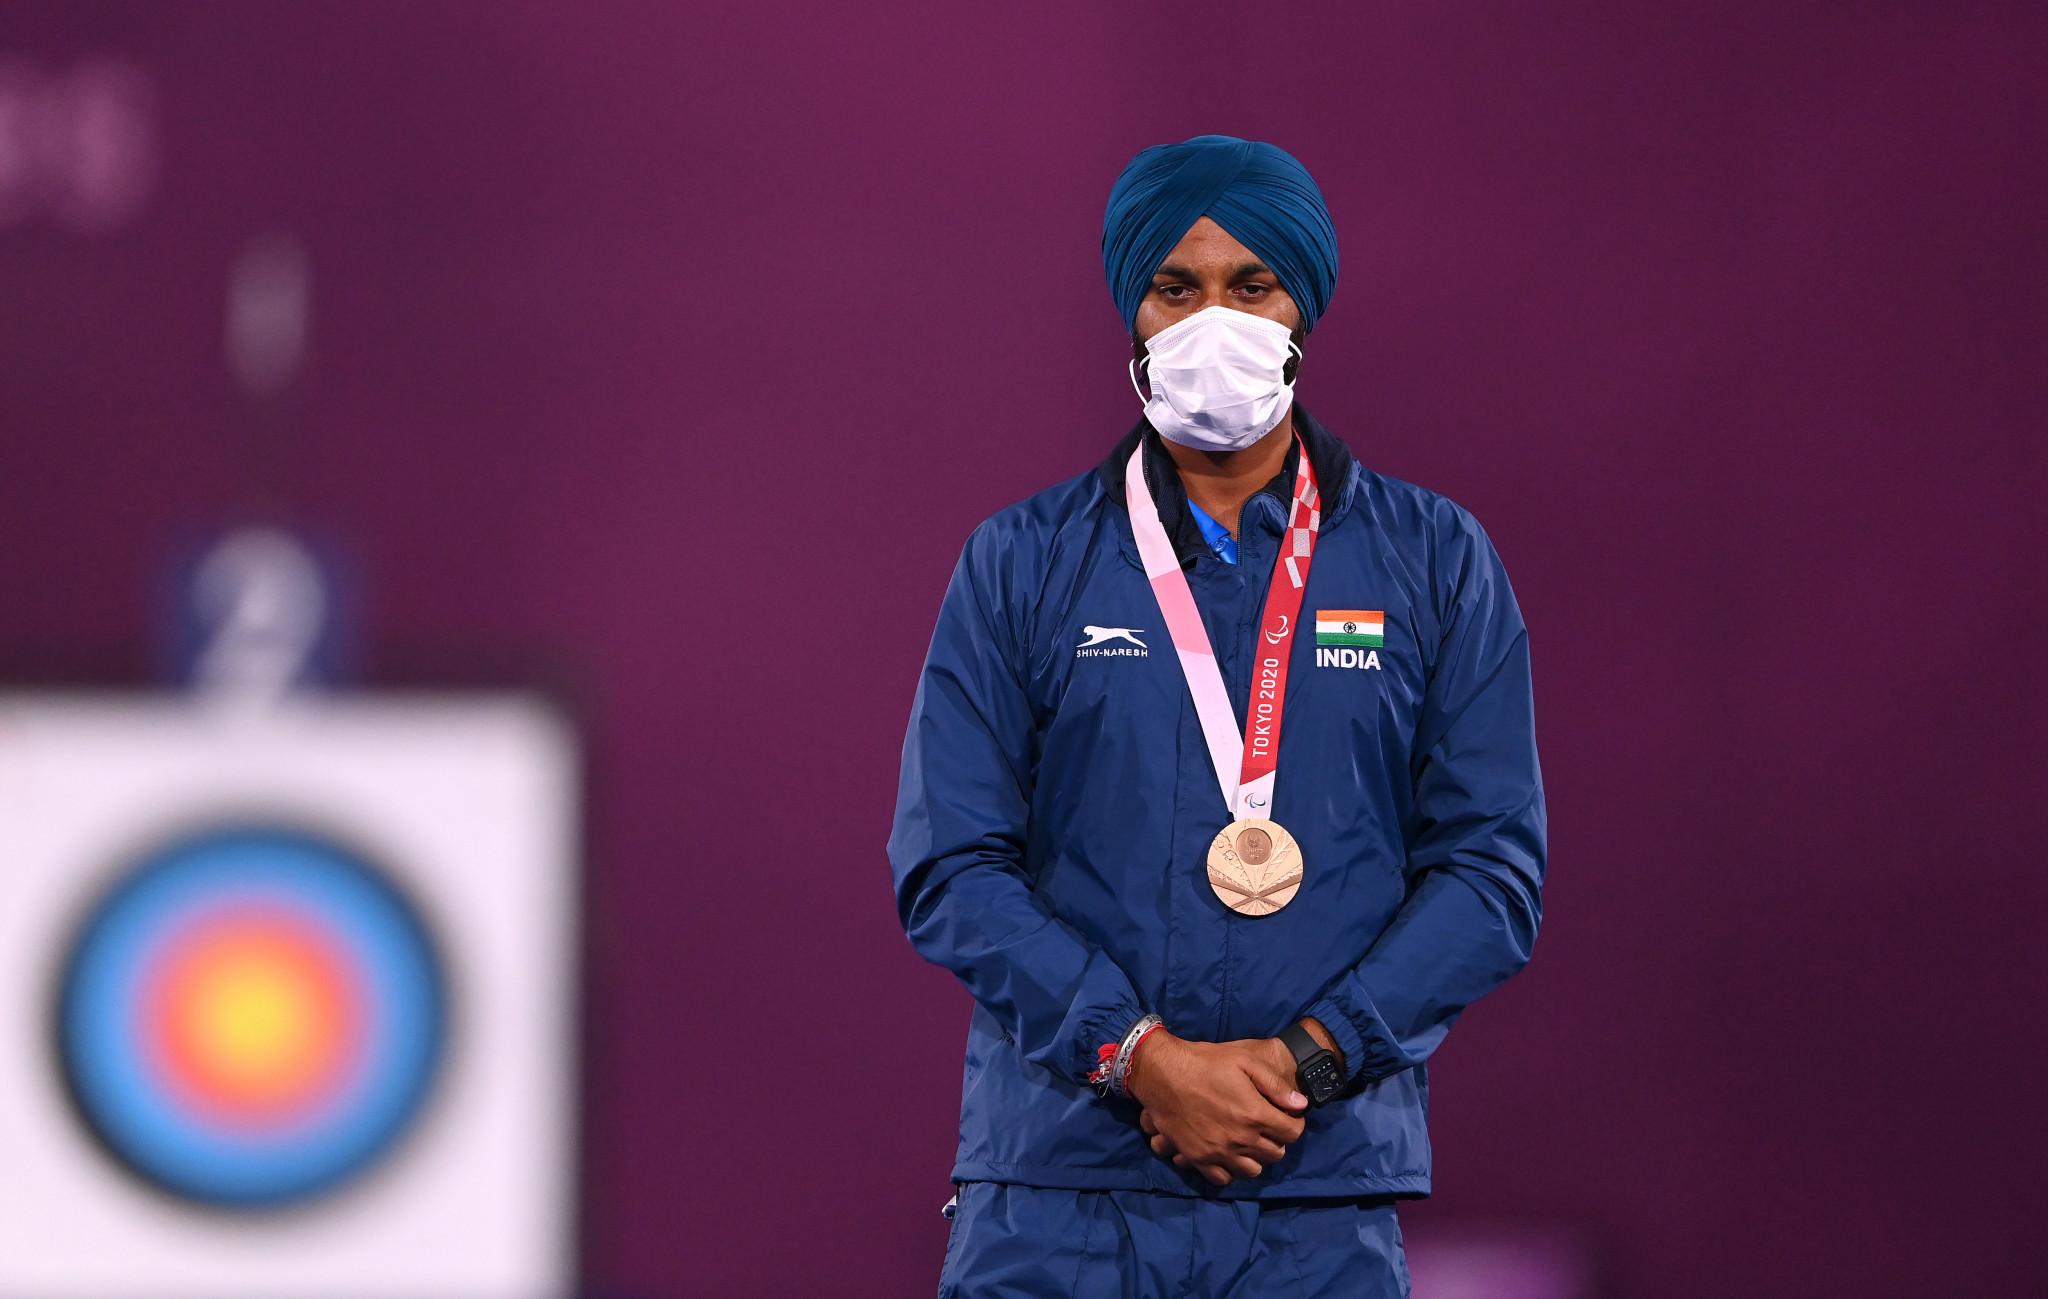 Harvinder Singh beat South Korean Kim Min Su 6-5 to claim gold at Tokyo 2020 ©Getty Images